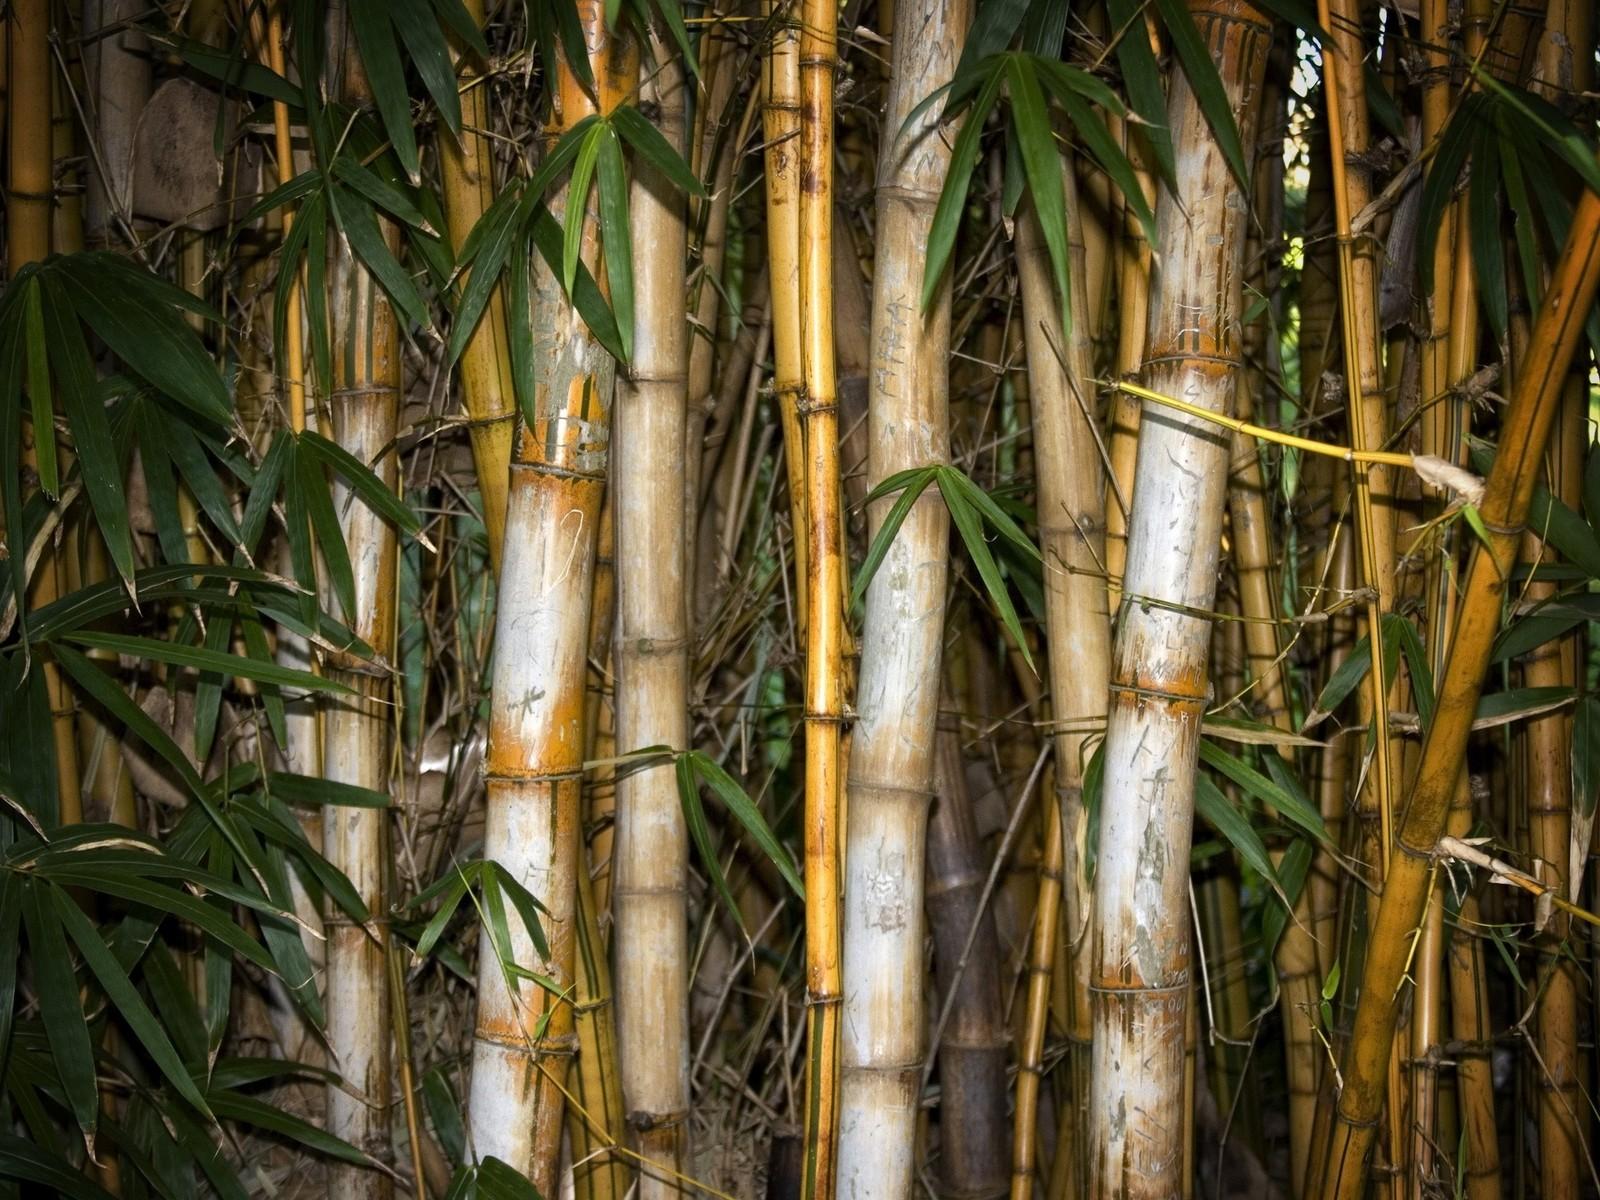 http://3.bp.blogspot.com/-Yz5rbK1gbH0/Tq0bfV1iQ5I/AAAAAAAABec/pDhI0UYCqBY/s1600/bamboo_forest_wallpaper2011.jpg